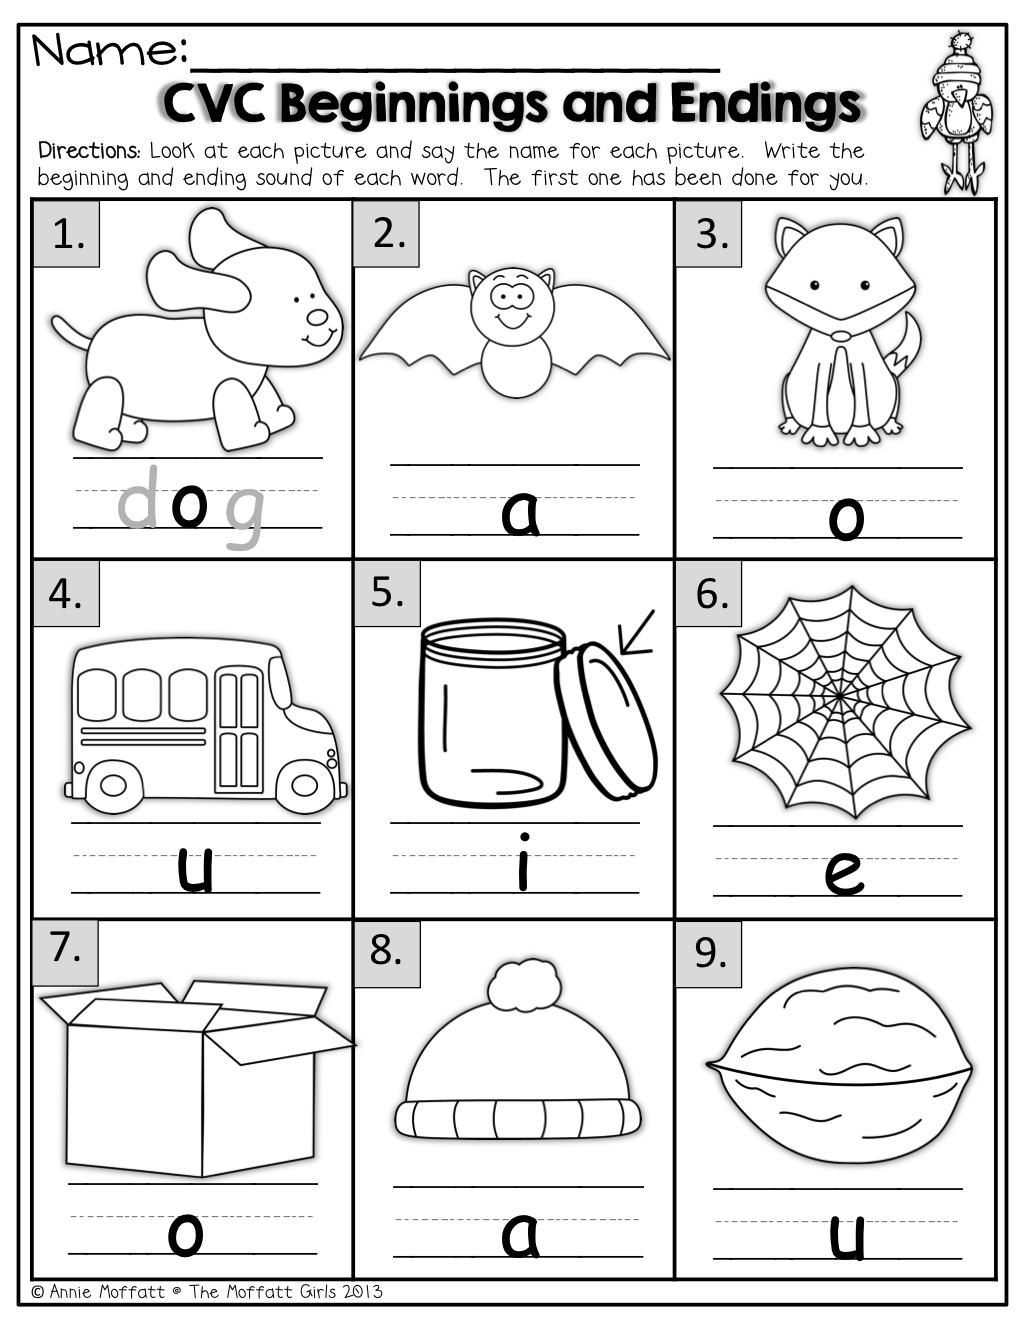 hight resolution of Pin by The Moffatt Girls on KinderLand Collaborative   Kindergarten  language arts